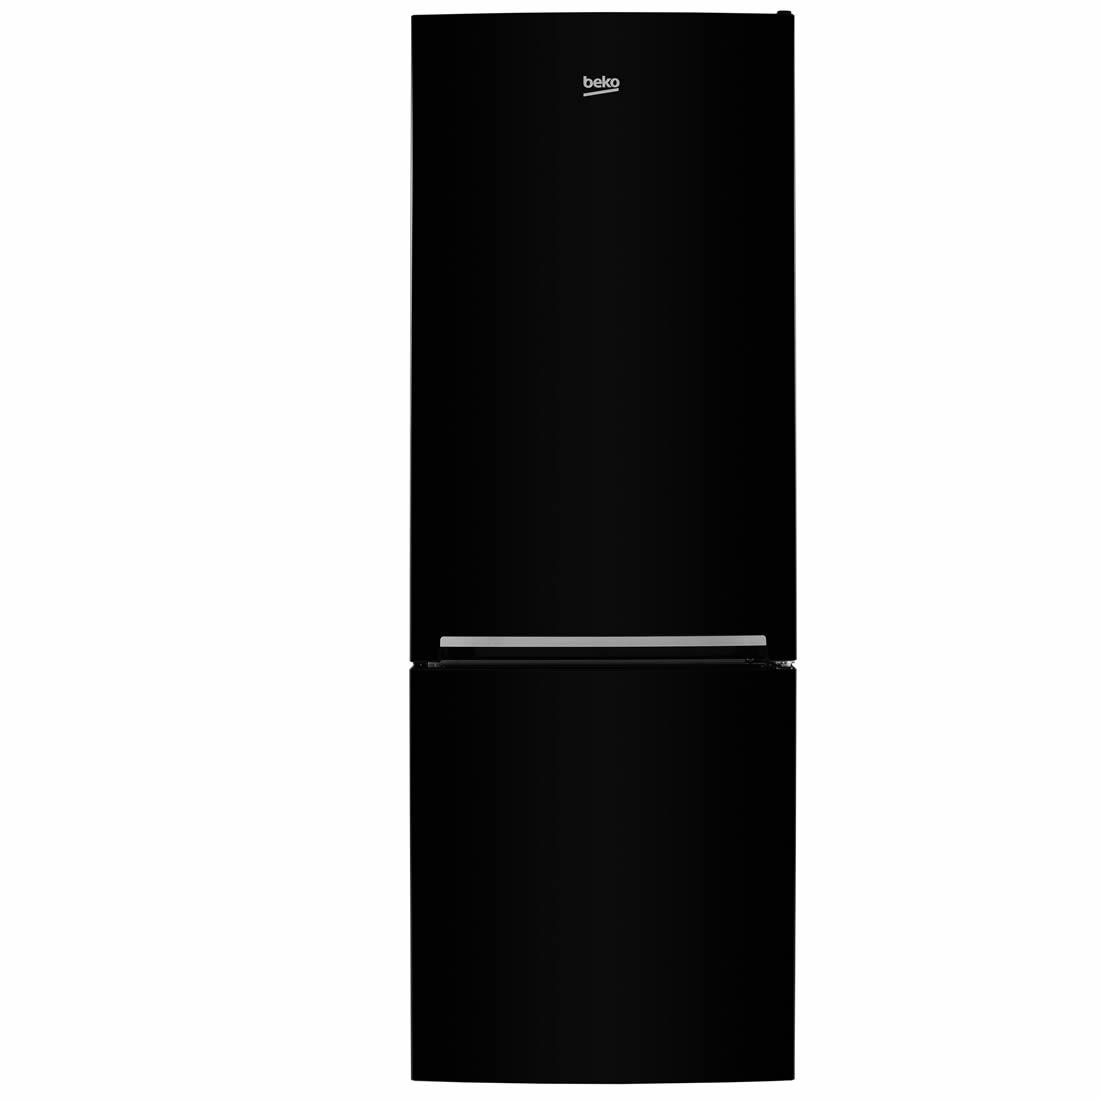 340litre Fridge Freezer Frost Free Class A+ Black